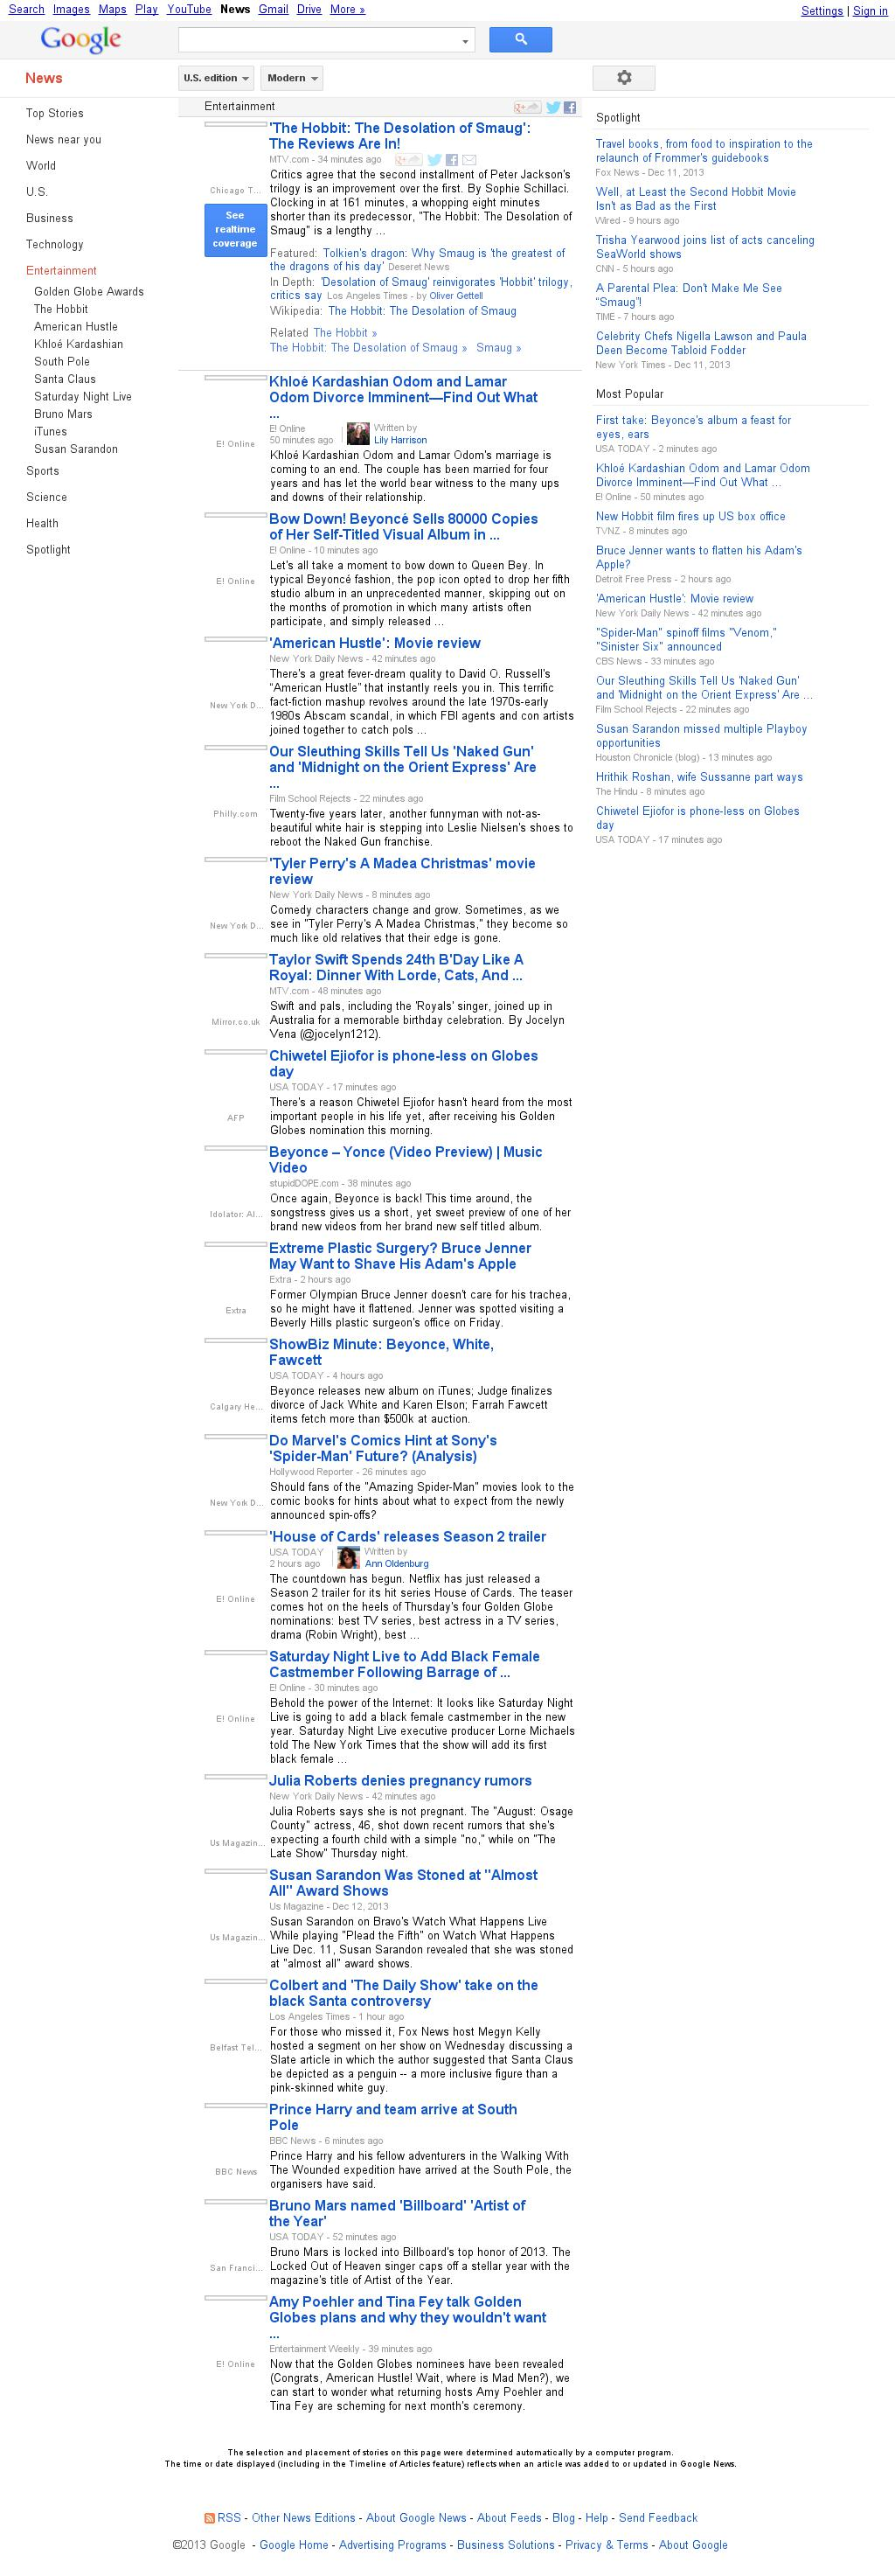 Google News: Entertainment at Friday Dec. 13, 2013, 9:06 p.m. UTC